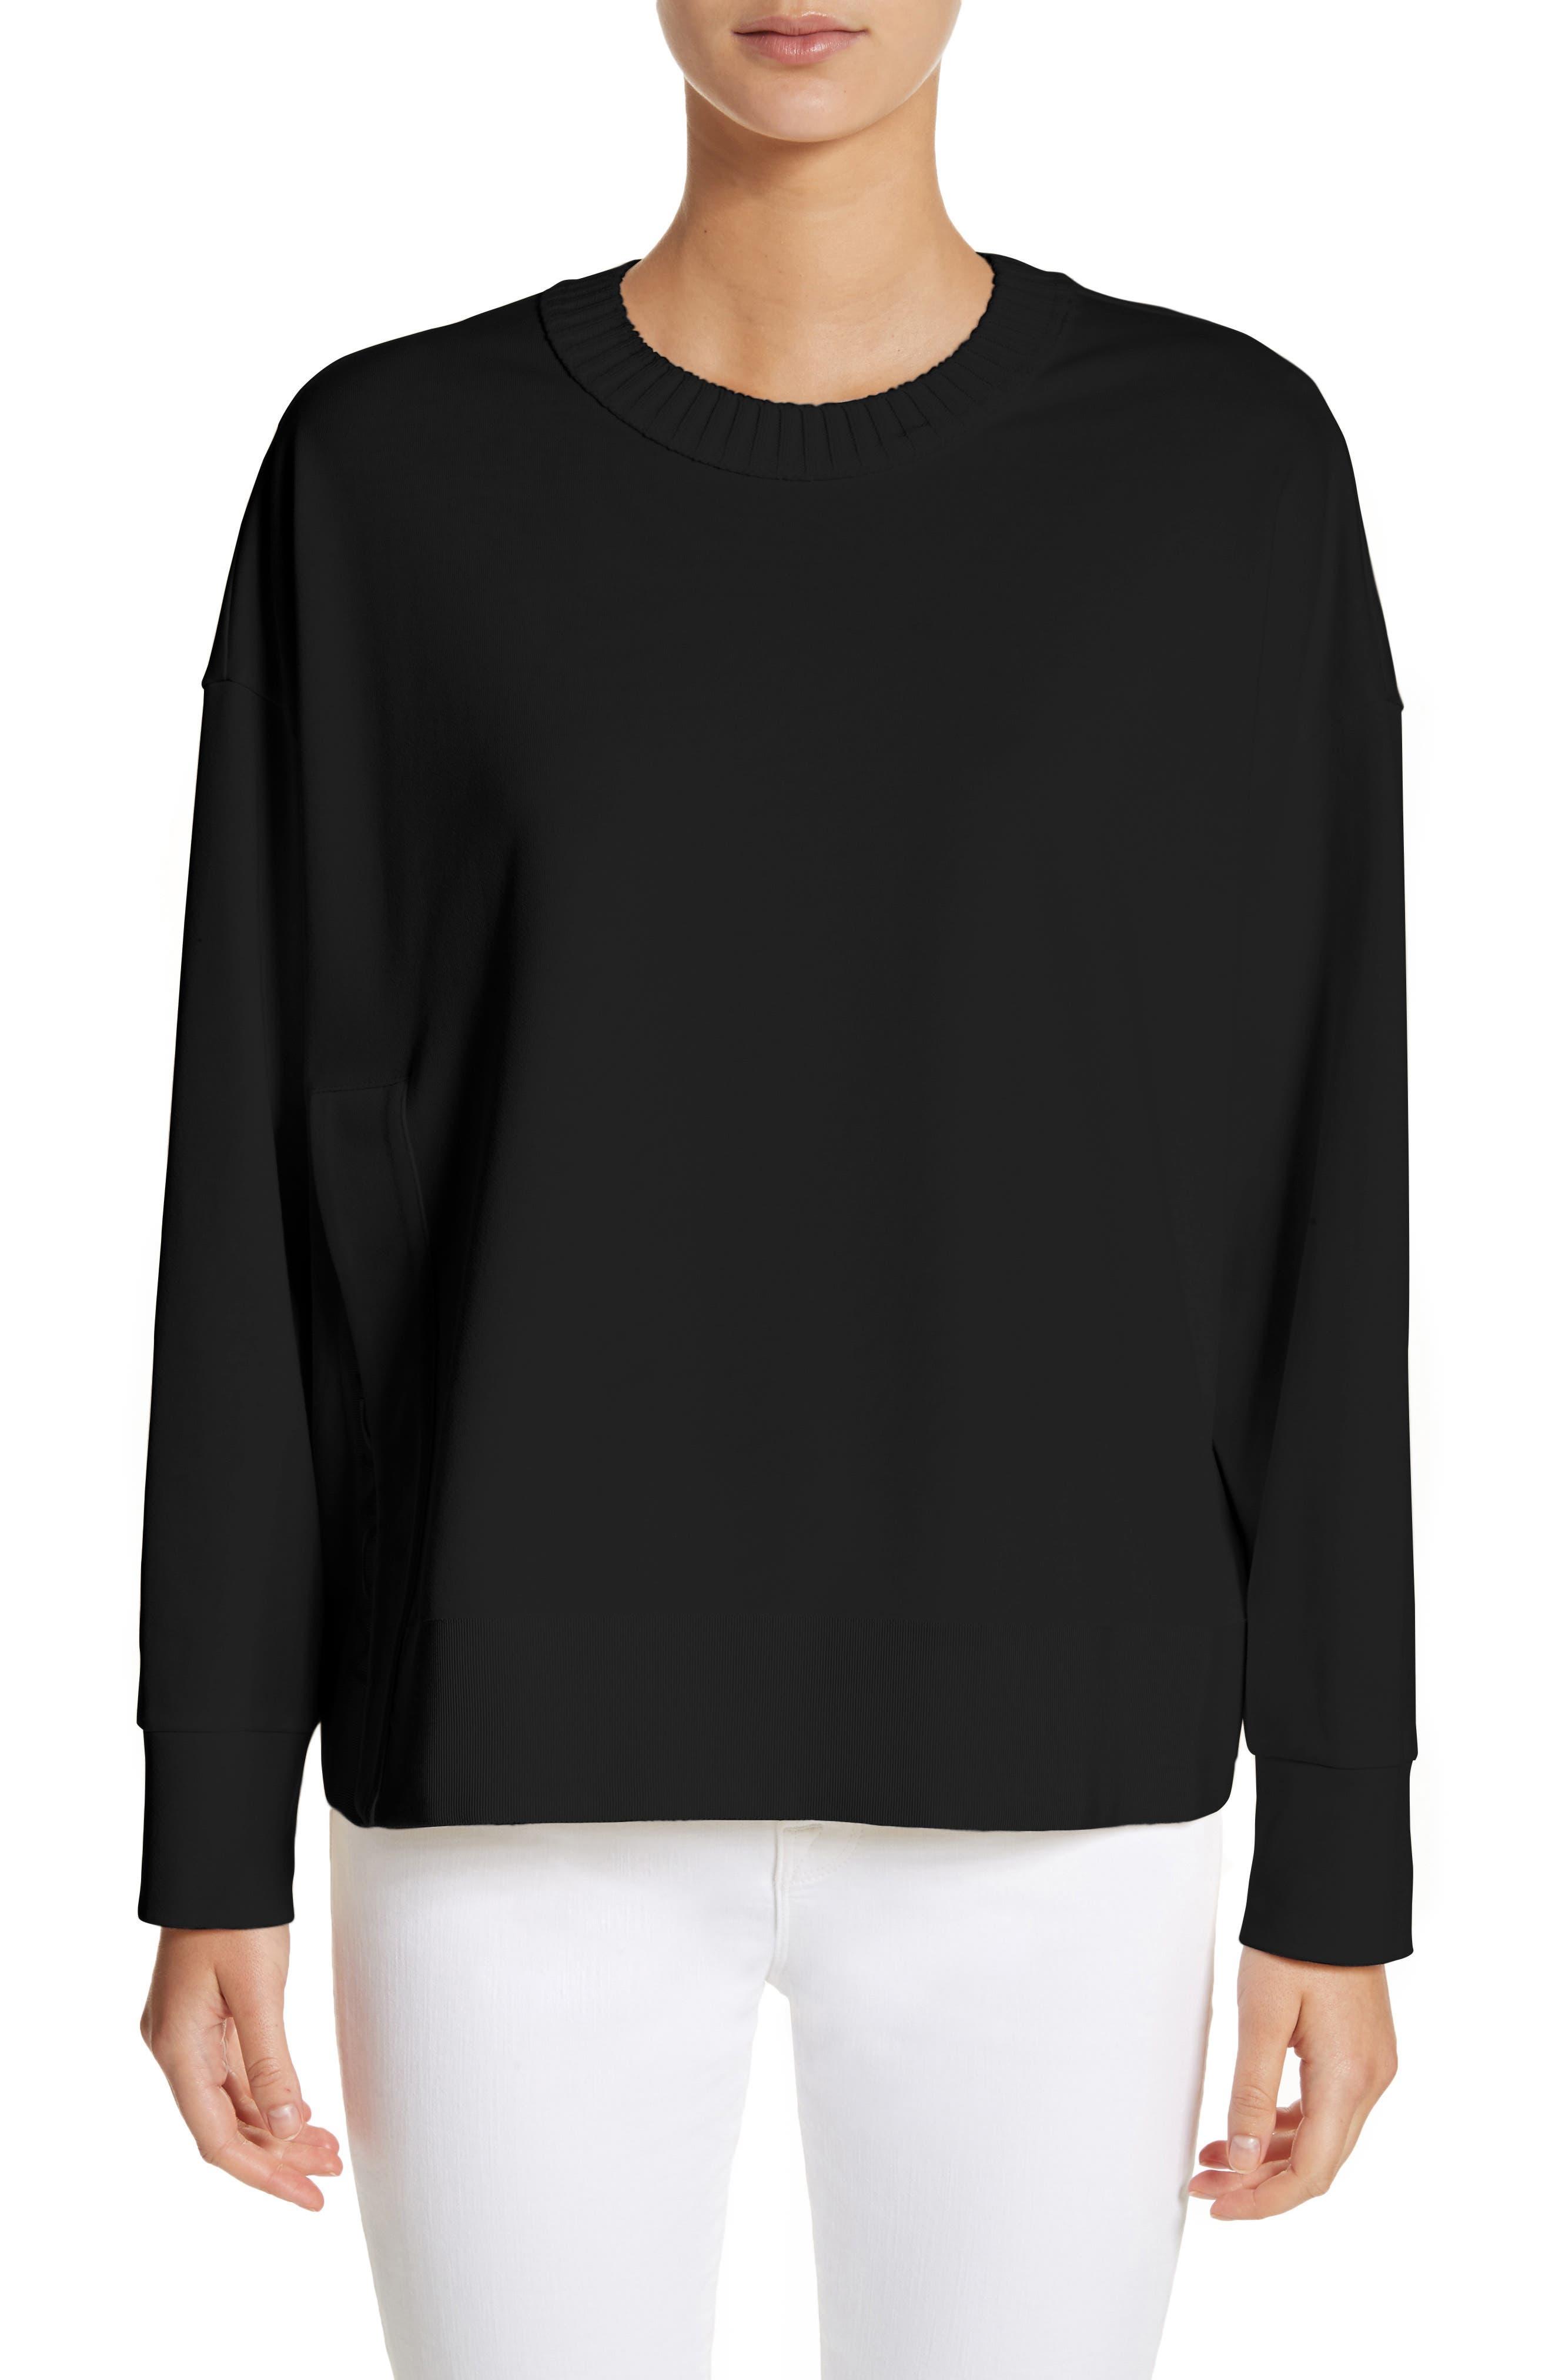 Cotton Sweatshirt,                             Main thumbnail 1, color,                             001